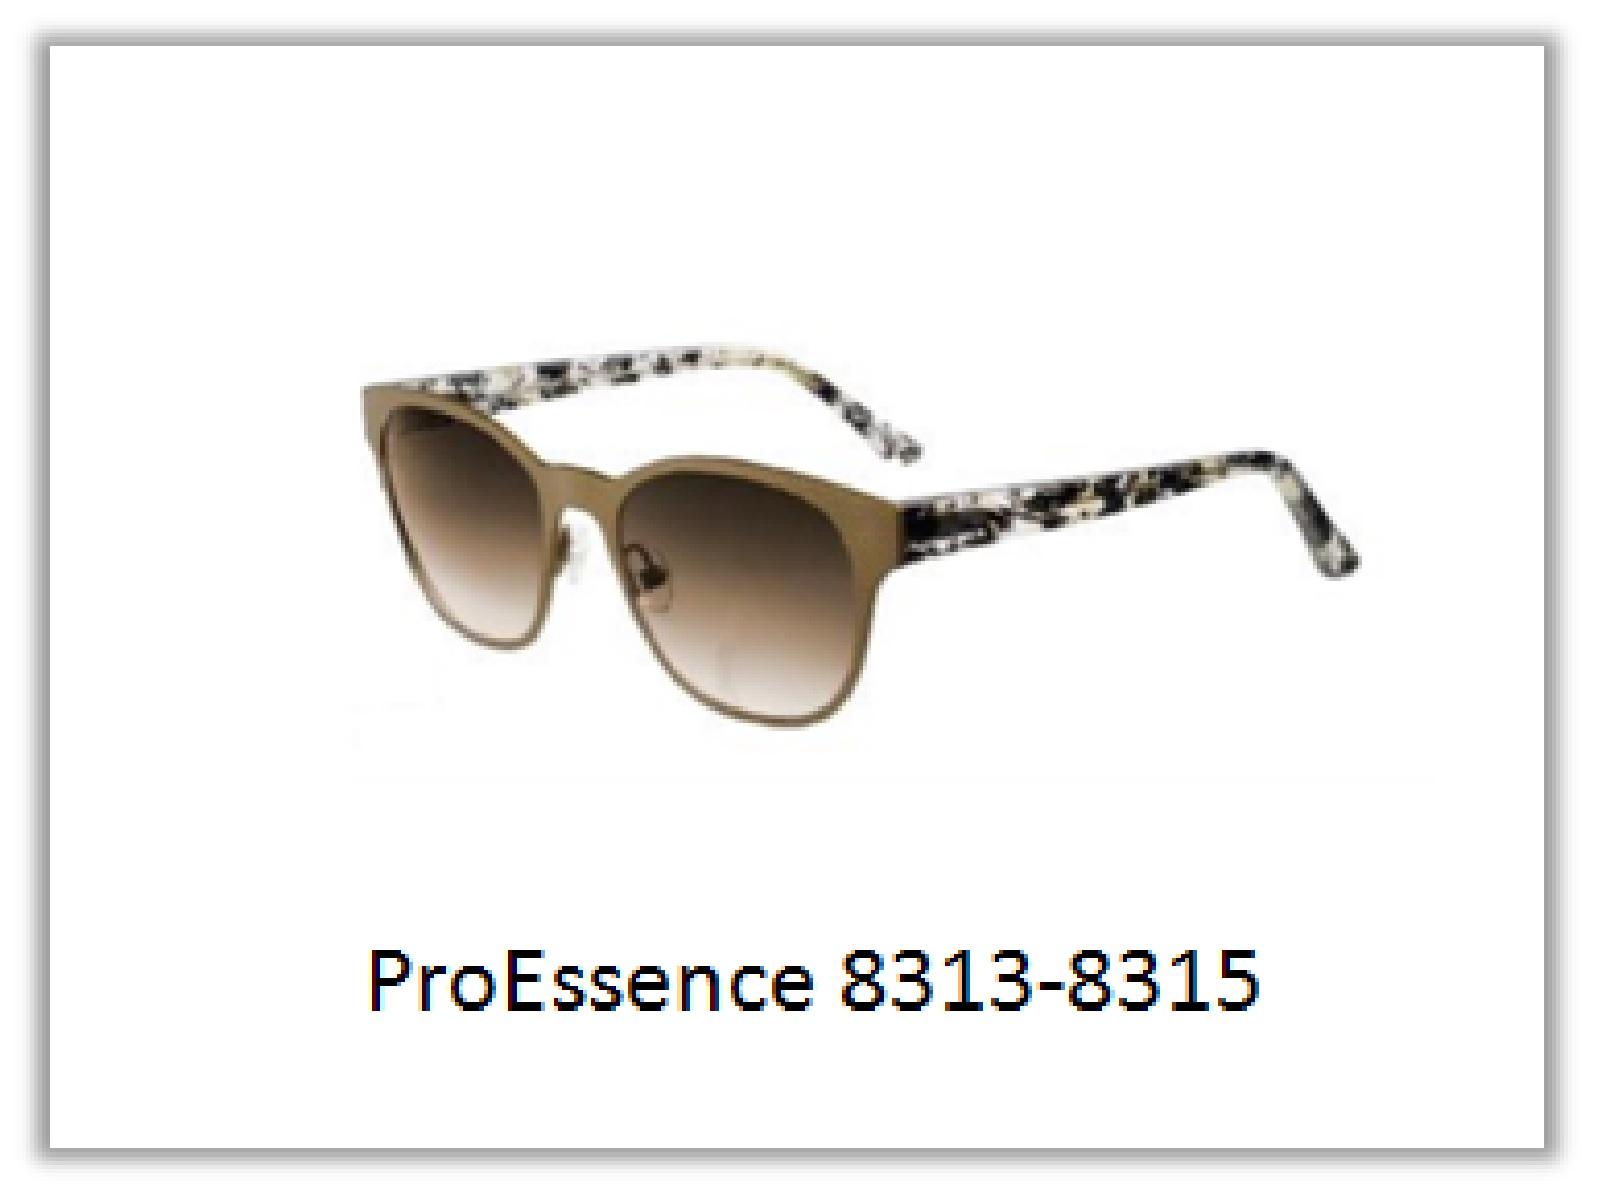 proessence 8313